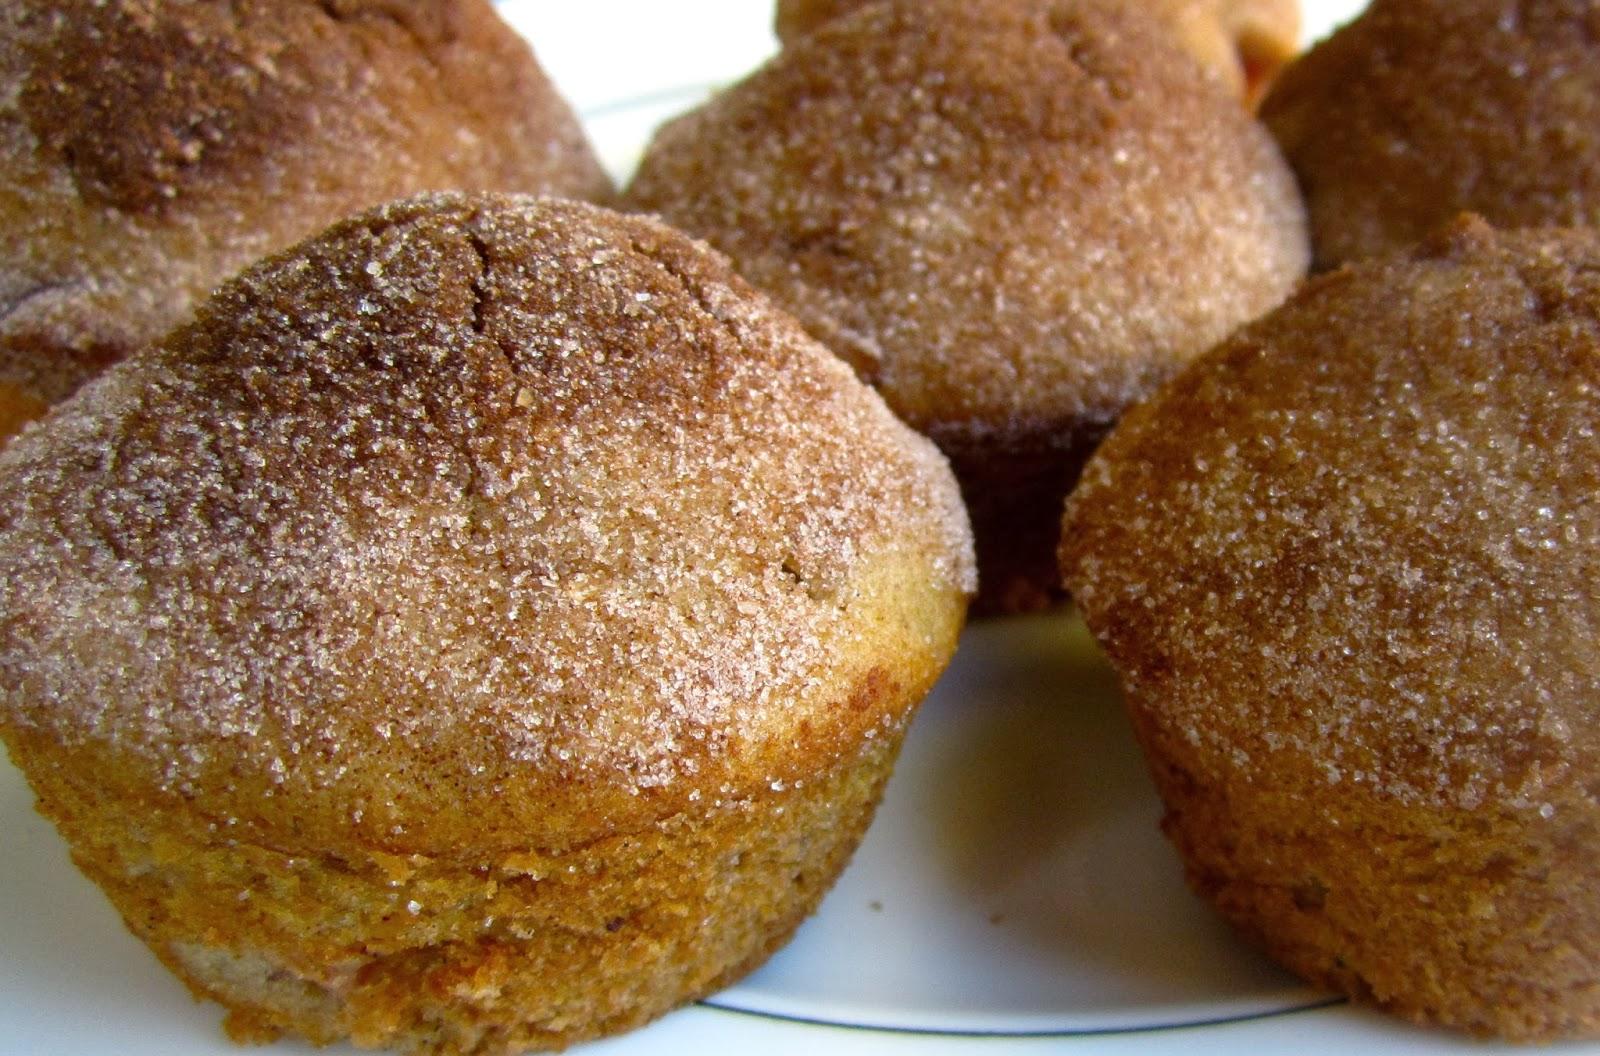 Brot & Meer: DONUT ODER MUFFIN? - APFELSAFT-DONUT-MUFFINS